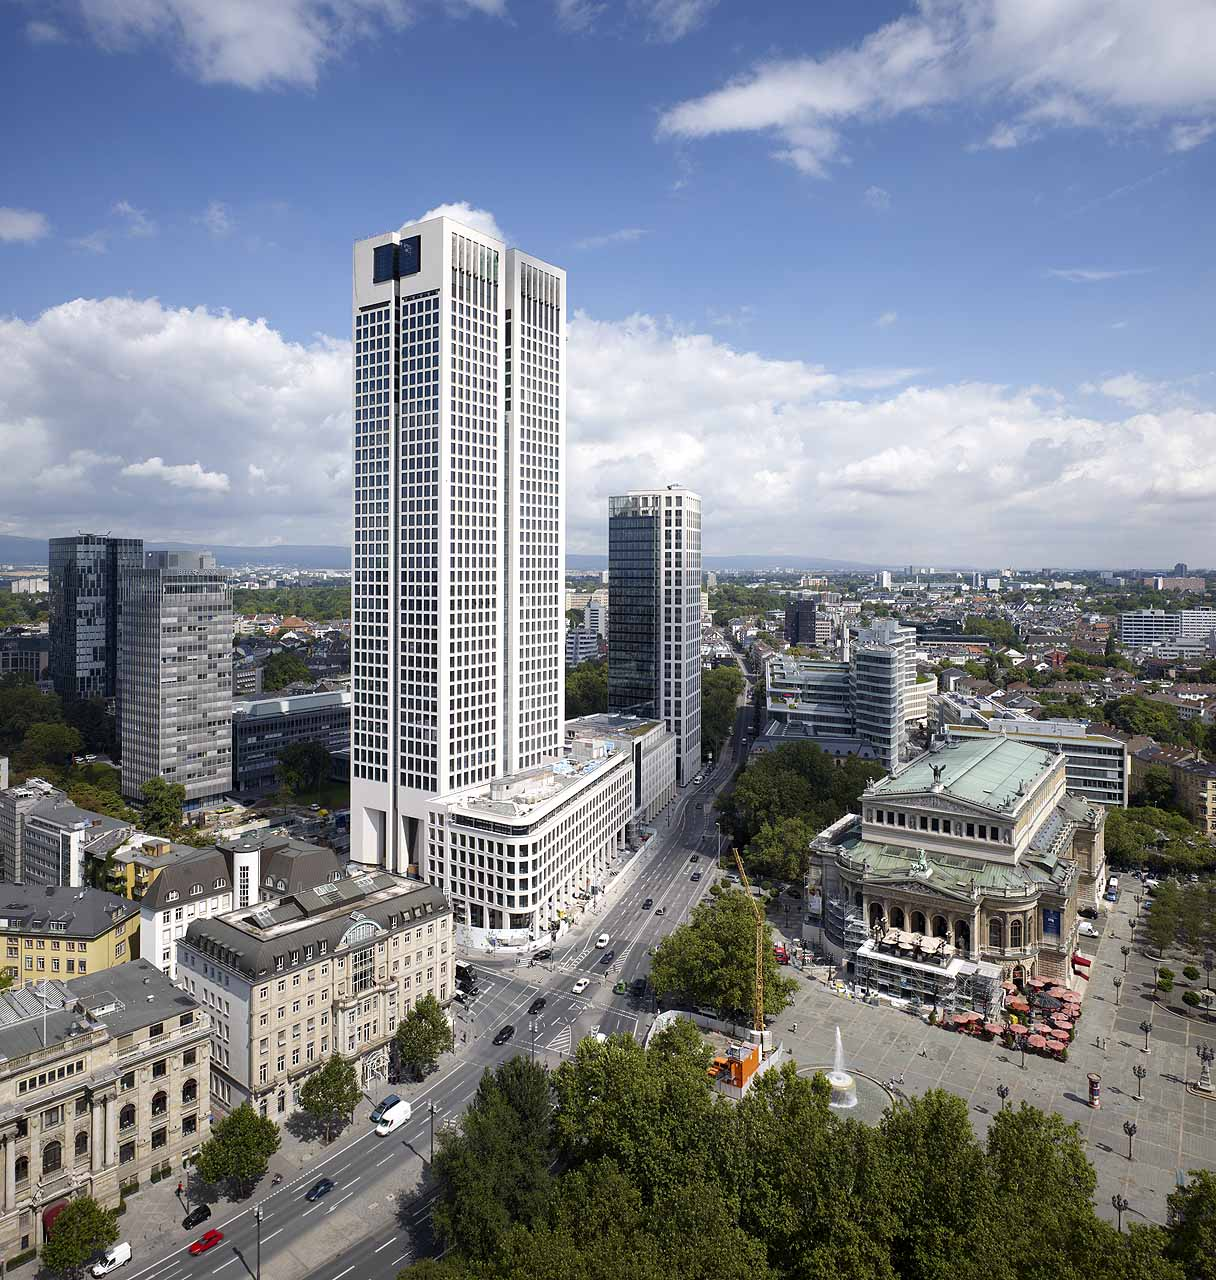 Baufirma Frankfurt baufirma frankfurt am delta gmbh richtfeste gehren fr